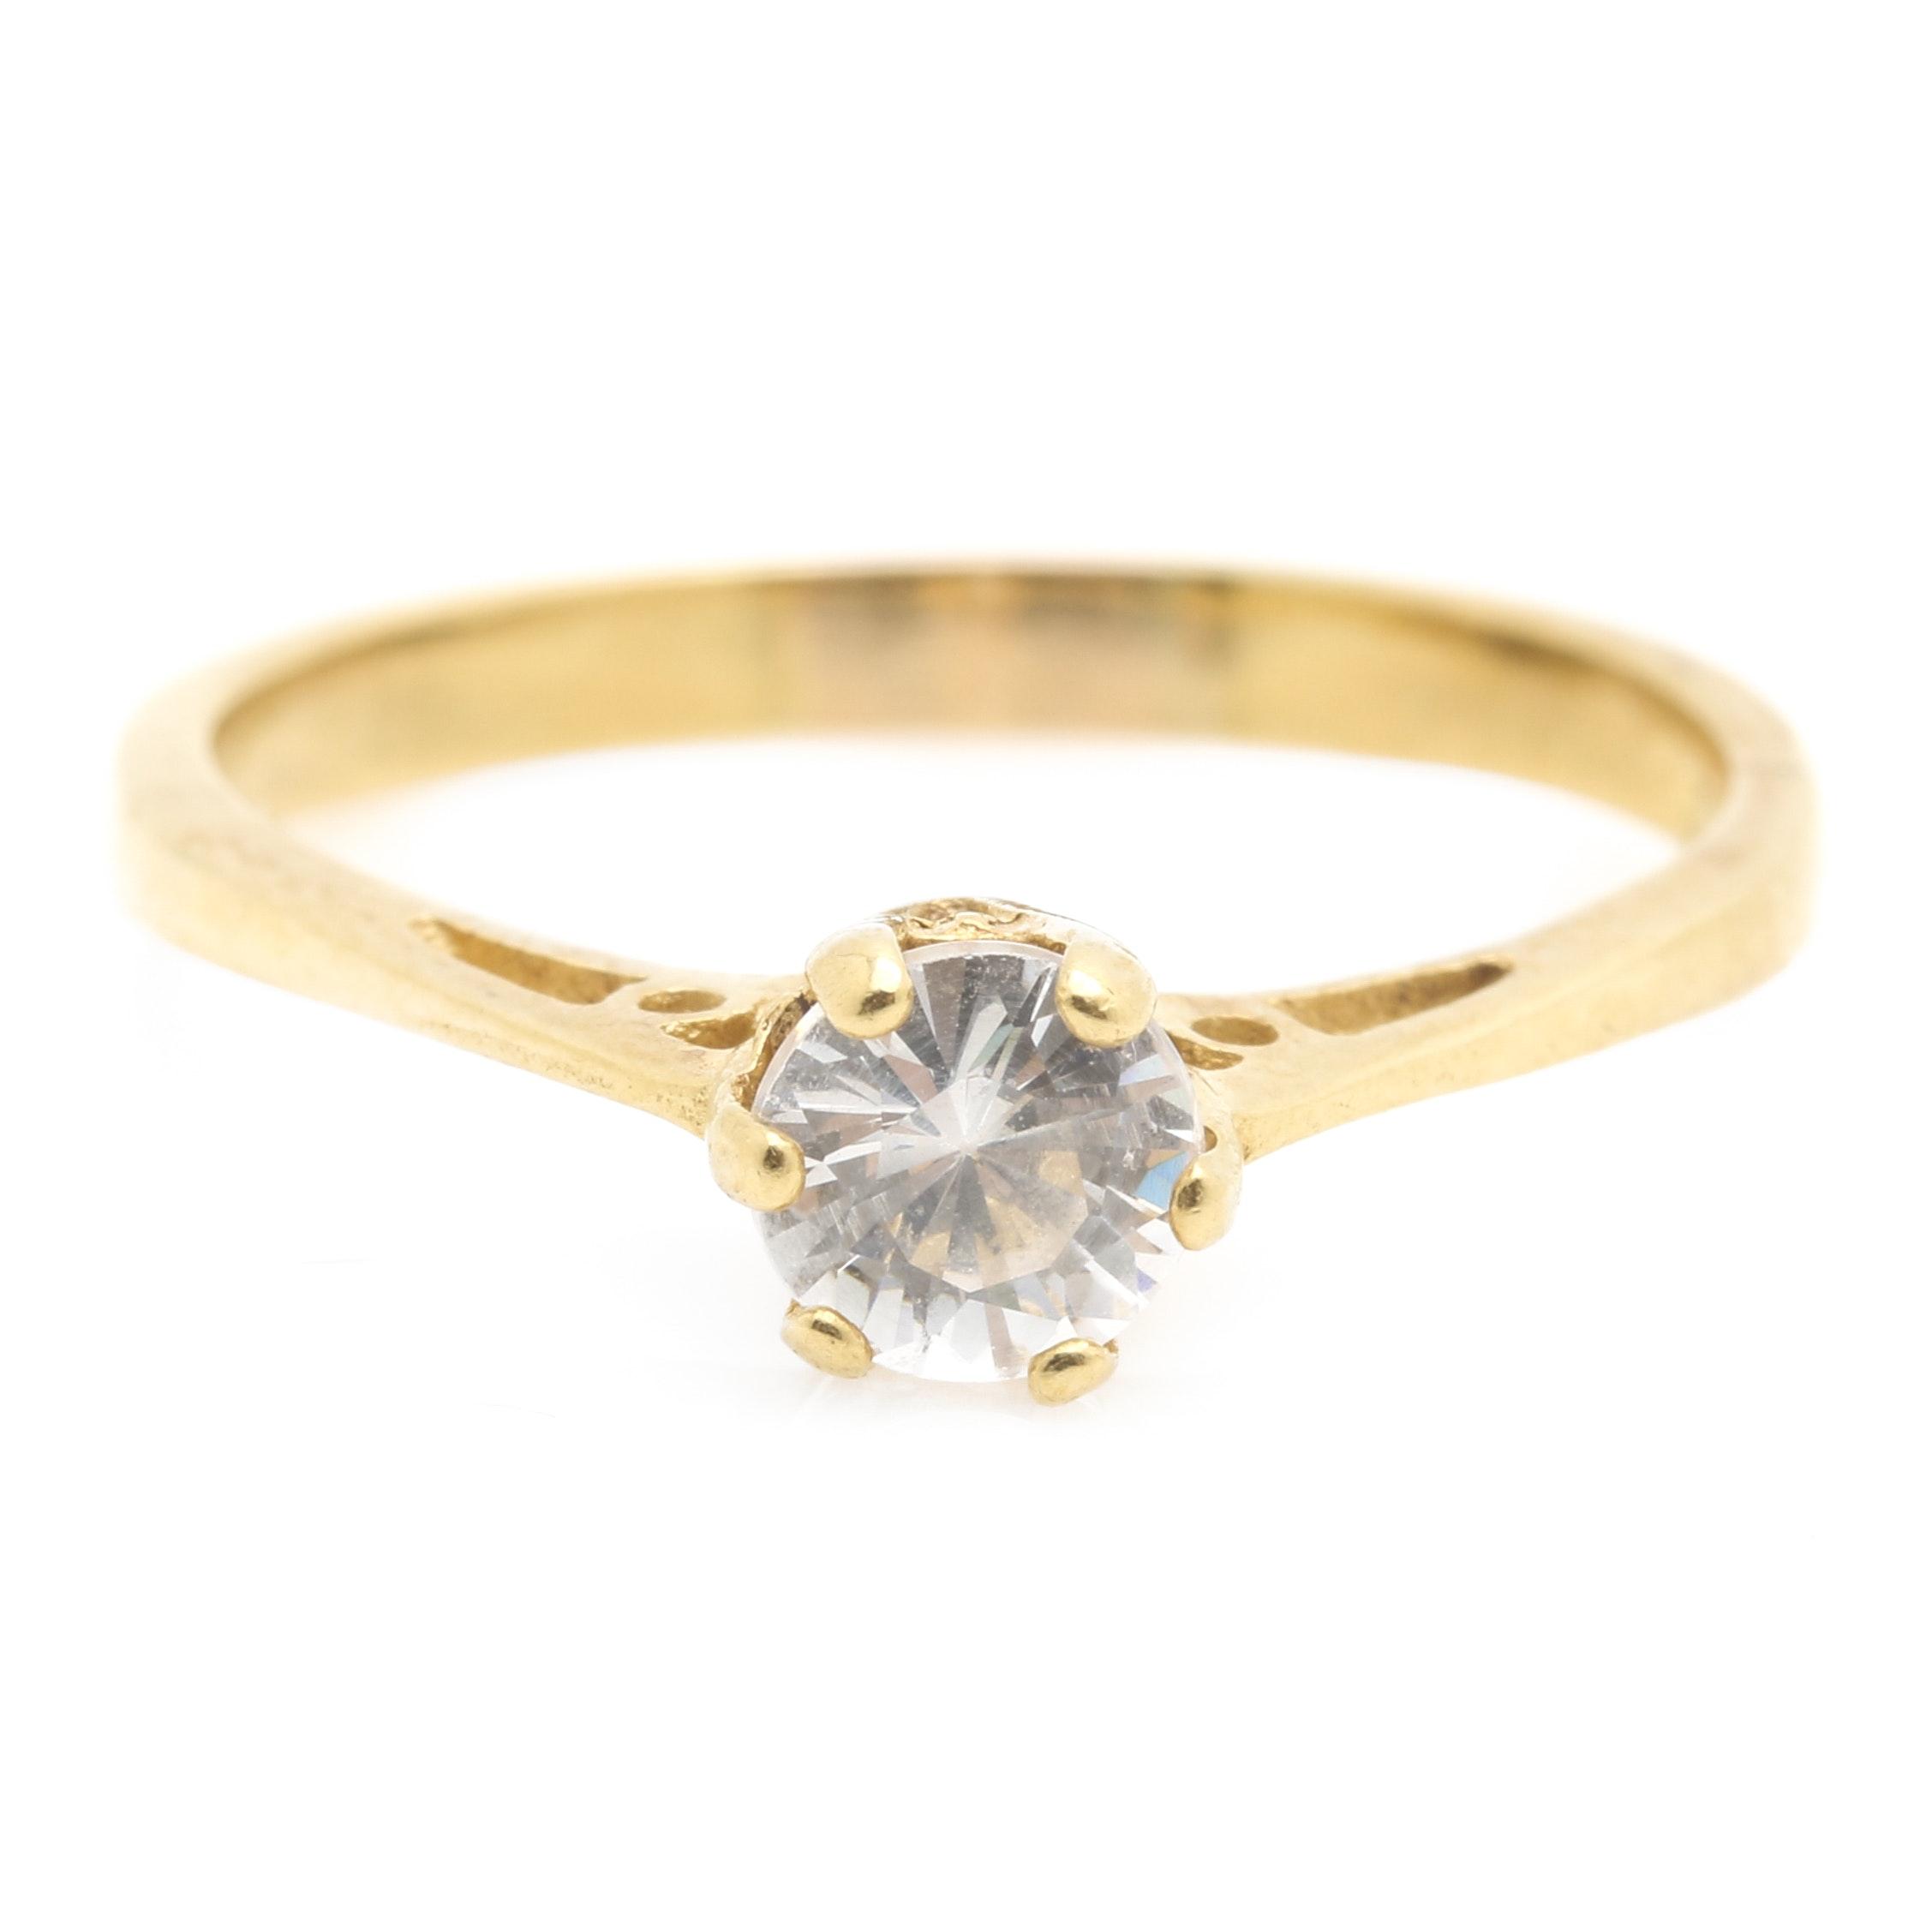 18K Yellow Gold Cubic Zirconia Ring